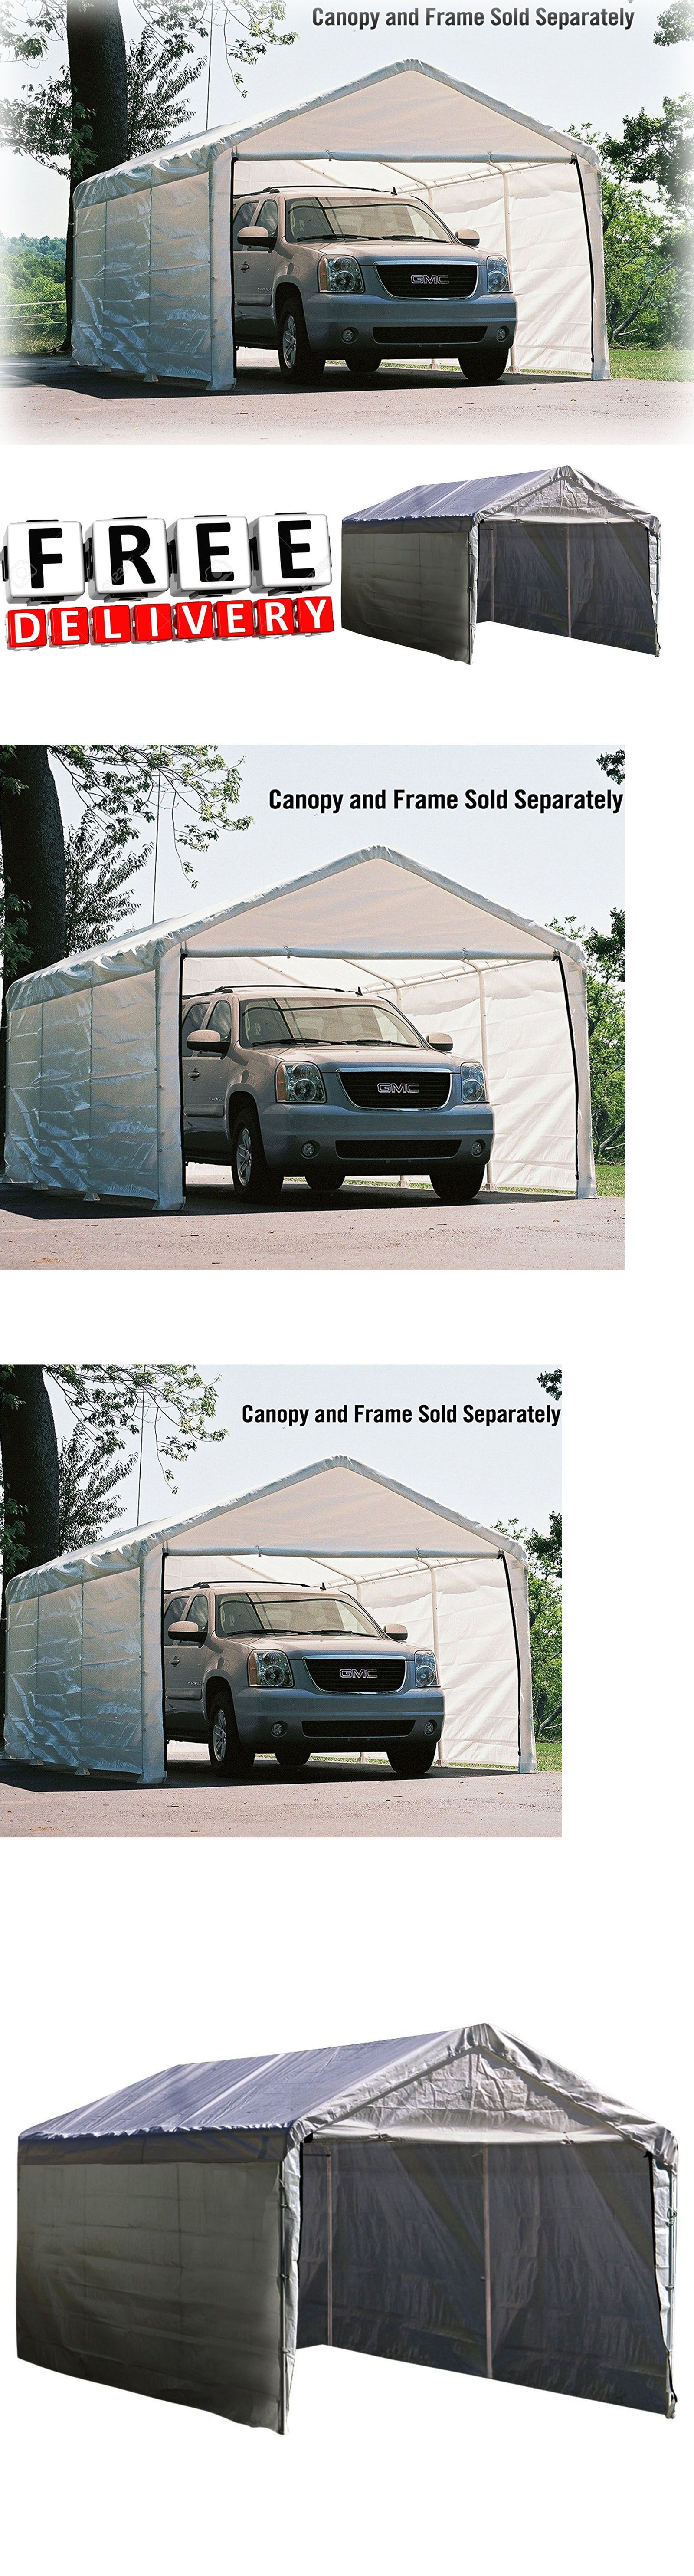 Canopy Enclosure Kit 12x20\' Shelter Portable UV Protection Garage ...